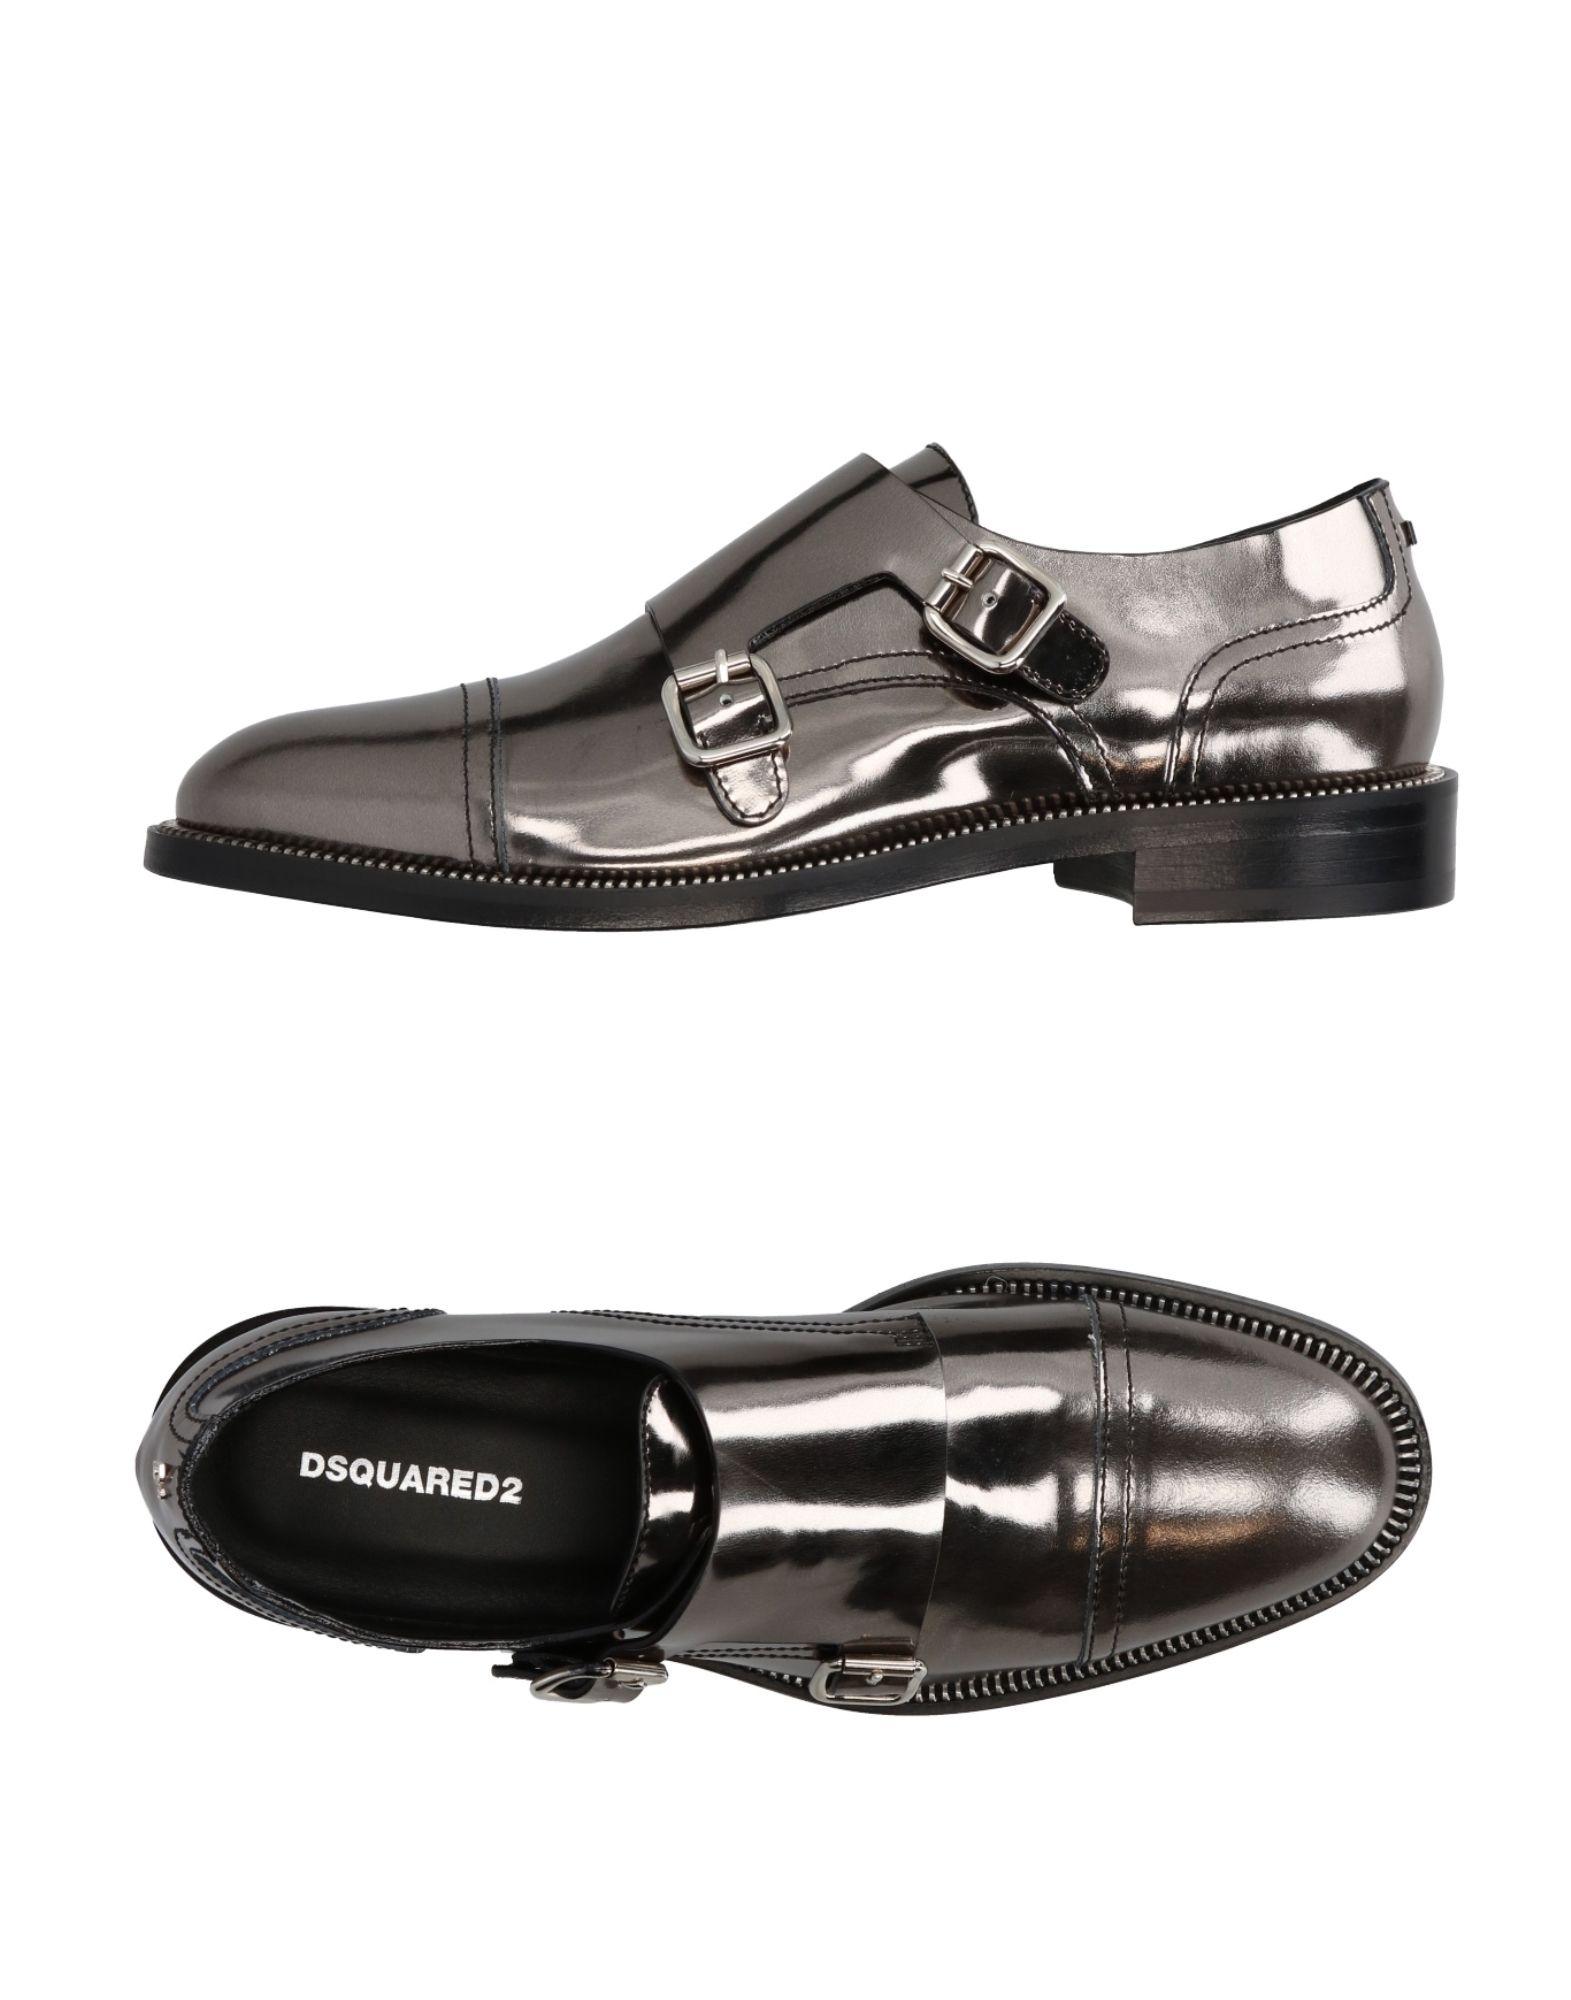 Dsquared2 Mokassins aussehende Damen  11298600NGGünstige gut aussehende Mokassins Schuhe df06f9